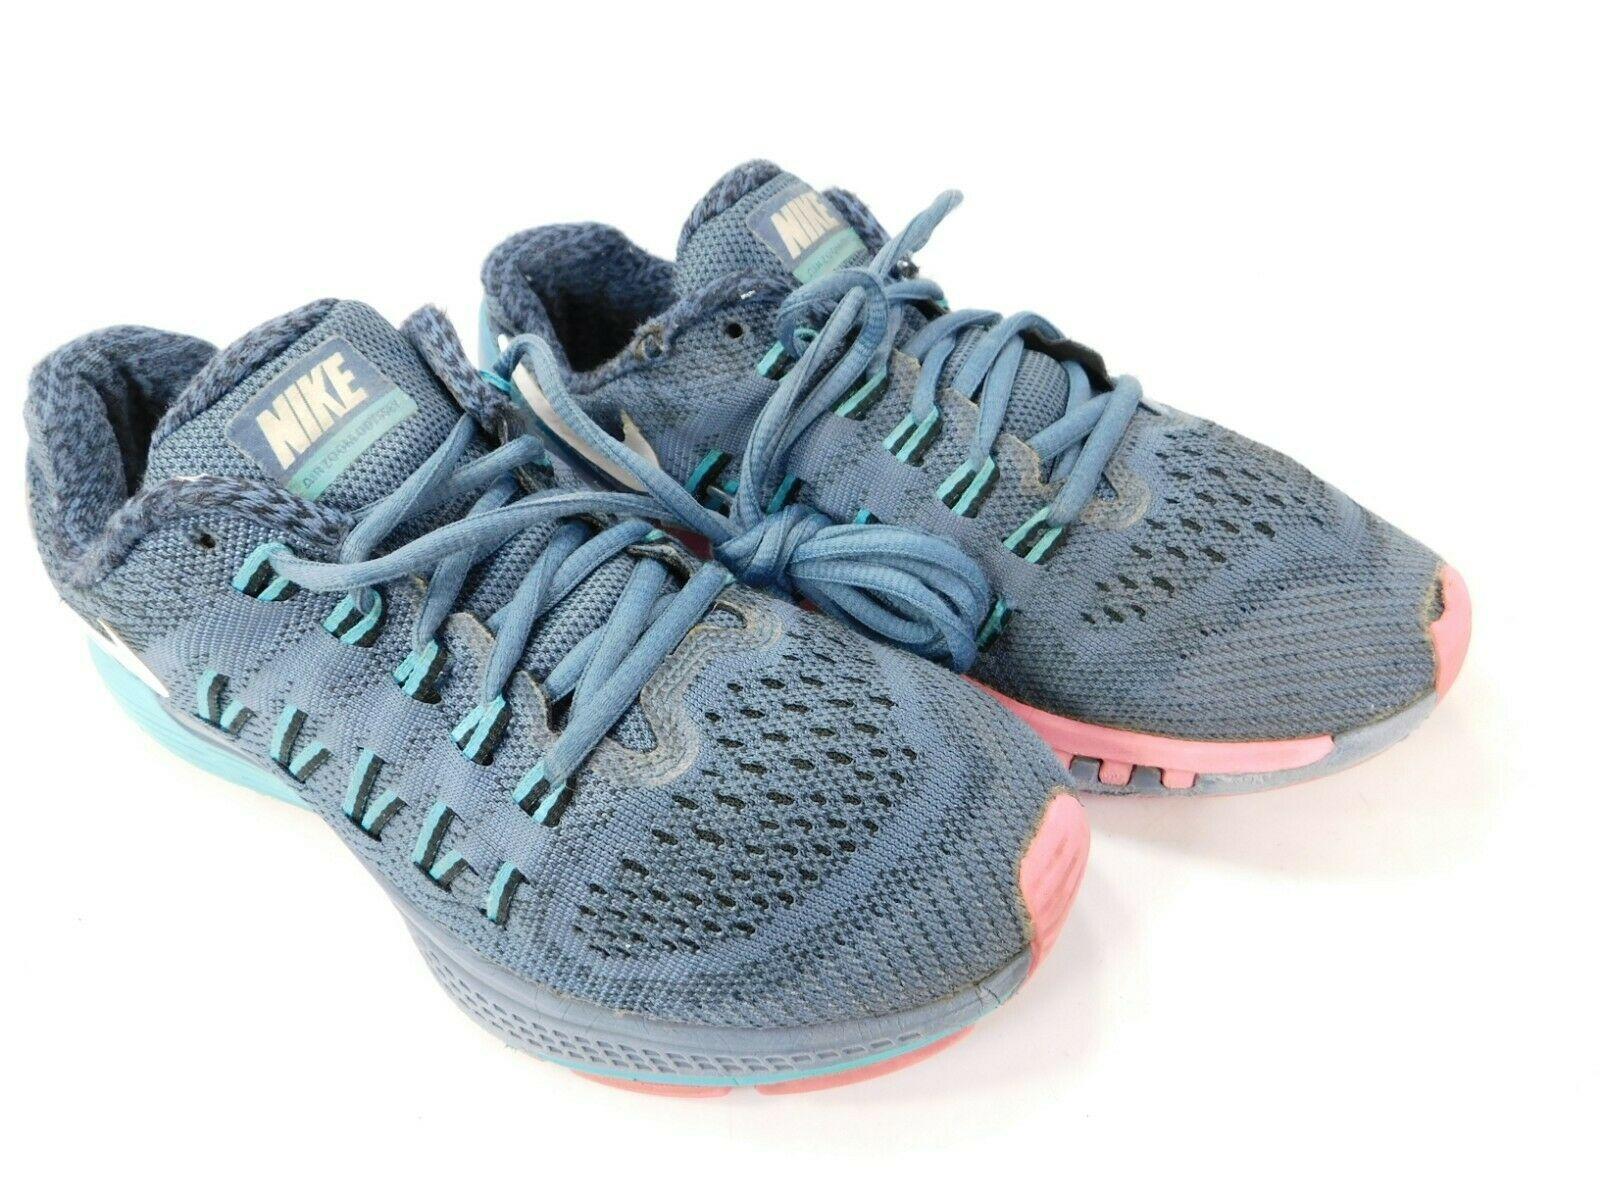 Nike Air Max 97 Damen Sneaker 921733 100 Weiß Fashion Schuhe Turnschuhe NEU | eBay